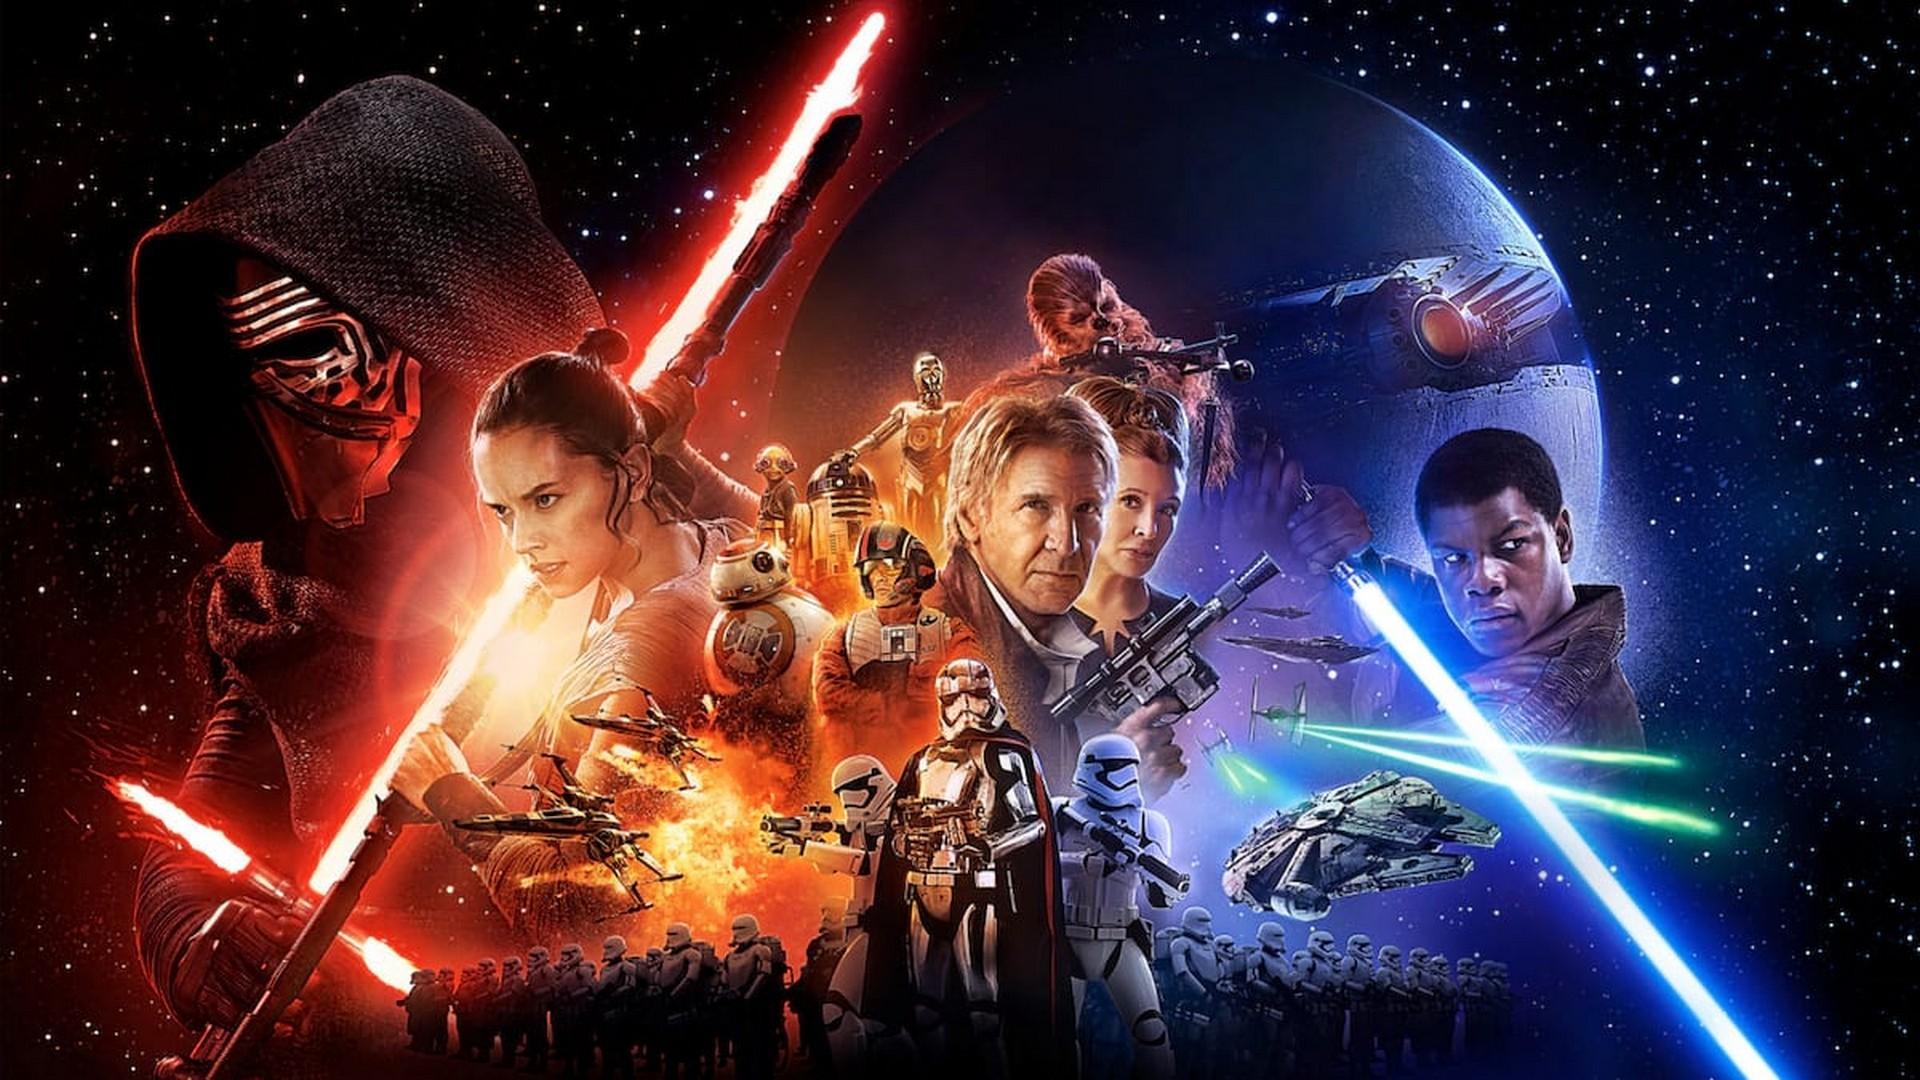 Star Wars Jedi Wallpaper Download Free High Resolution